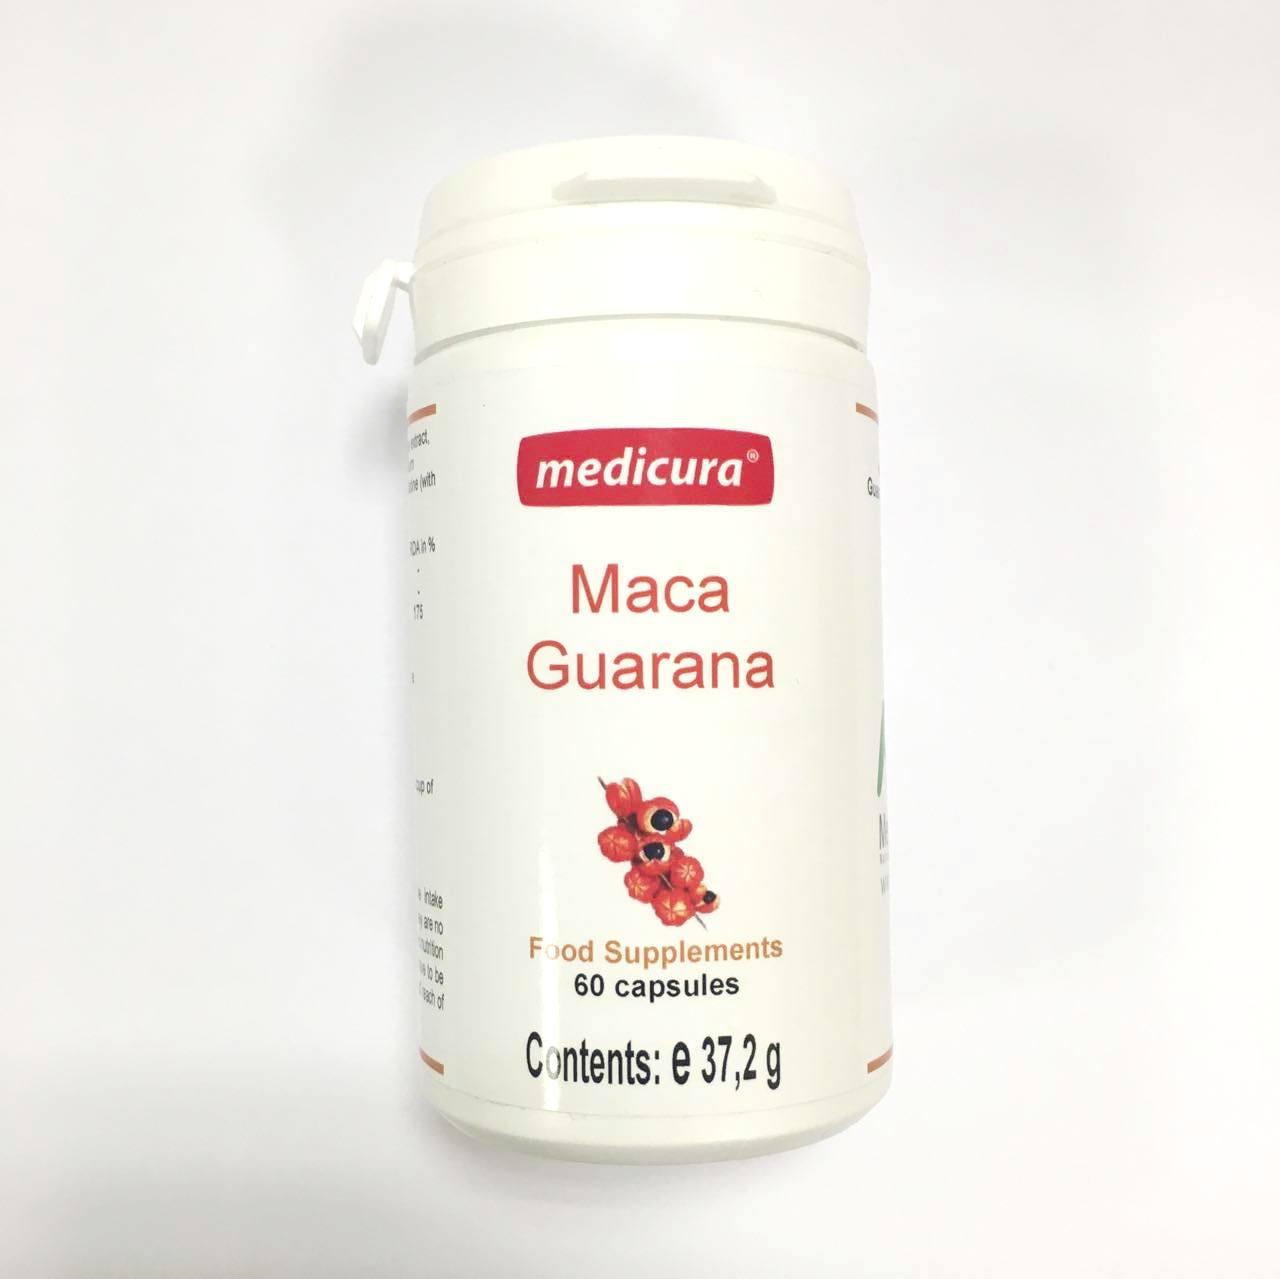 maca-guarana